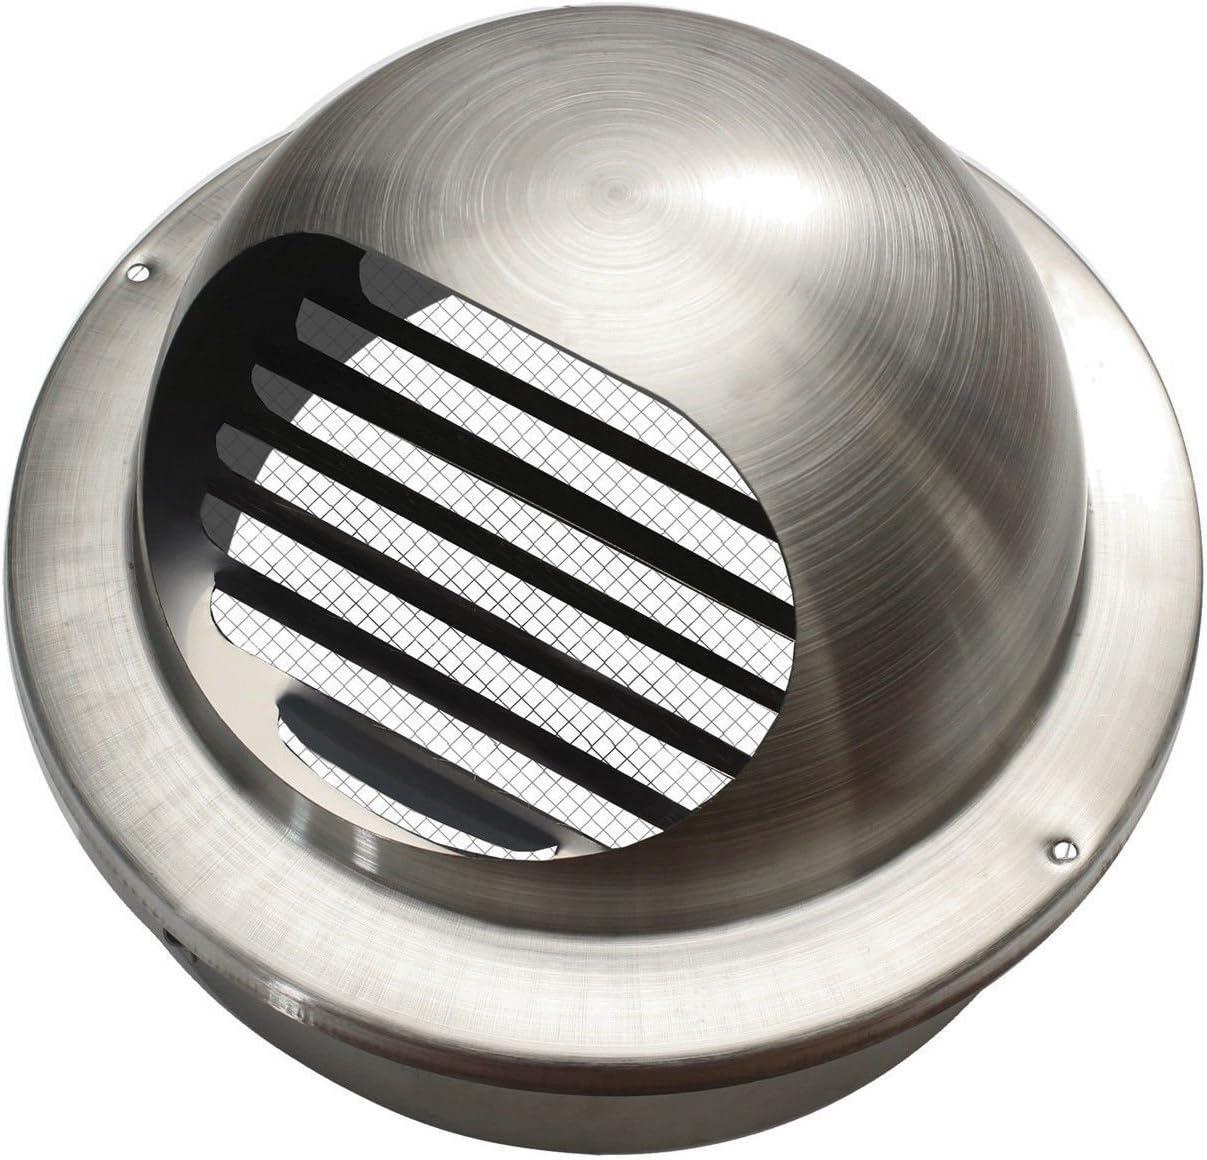 Edelstahl Ablufthaube flach Rohranschluss /Ø 100mm